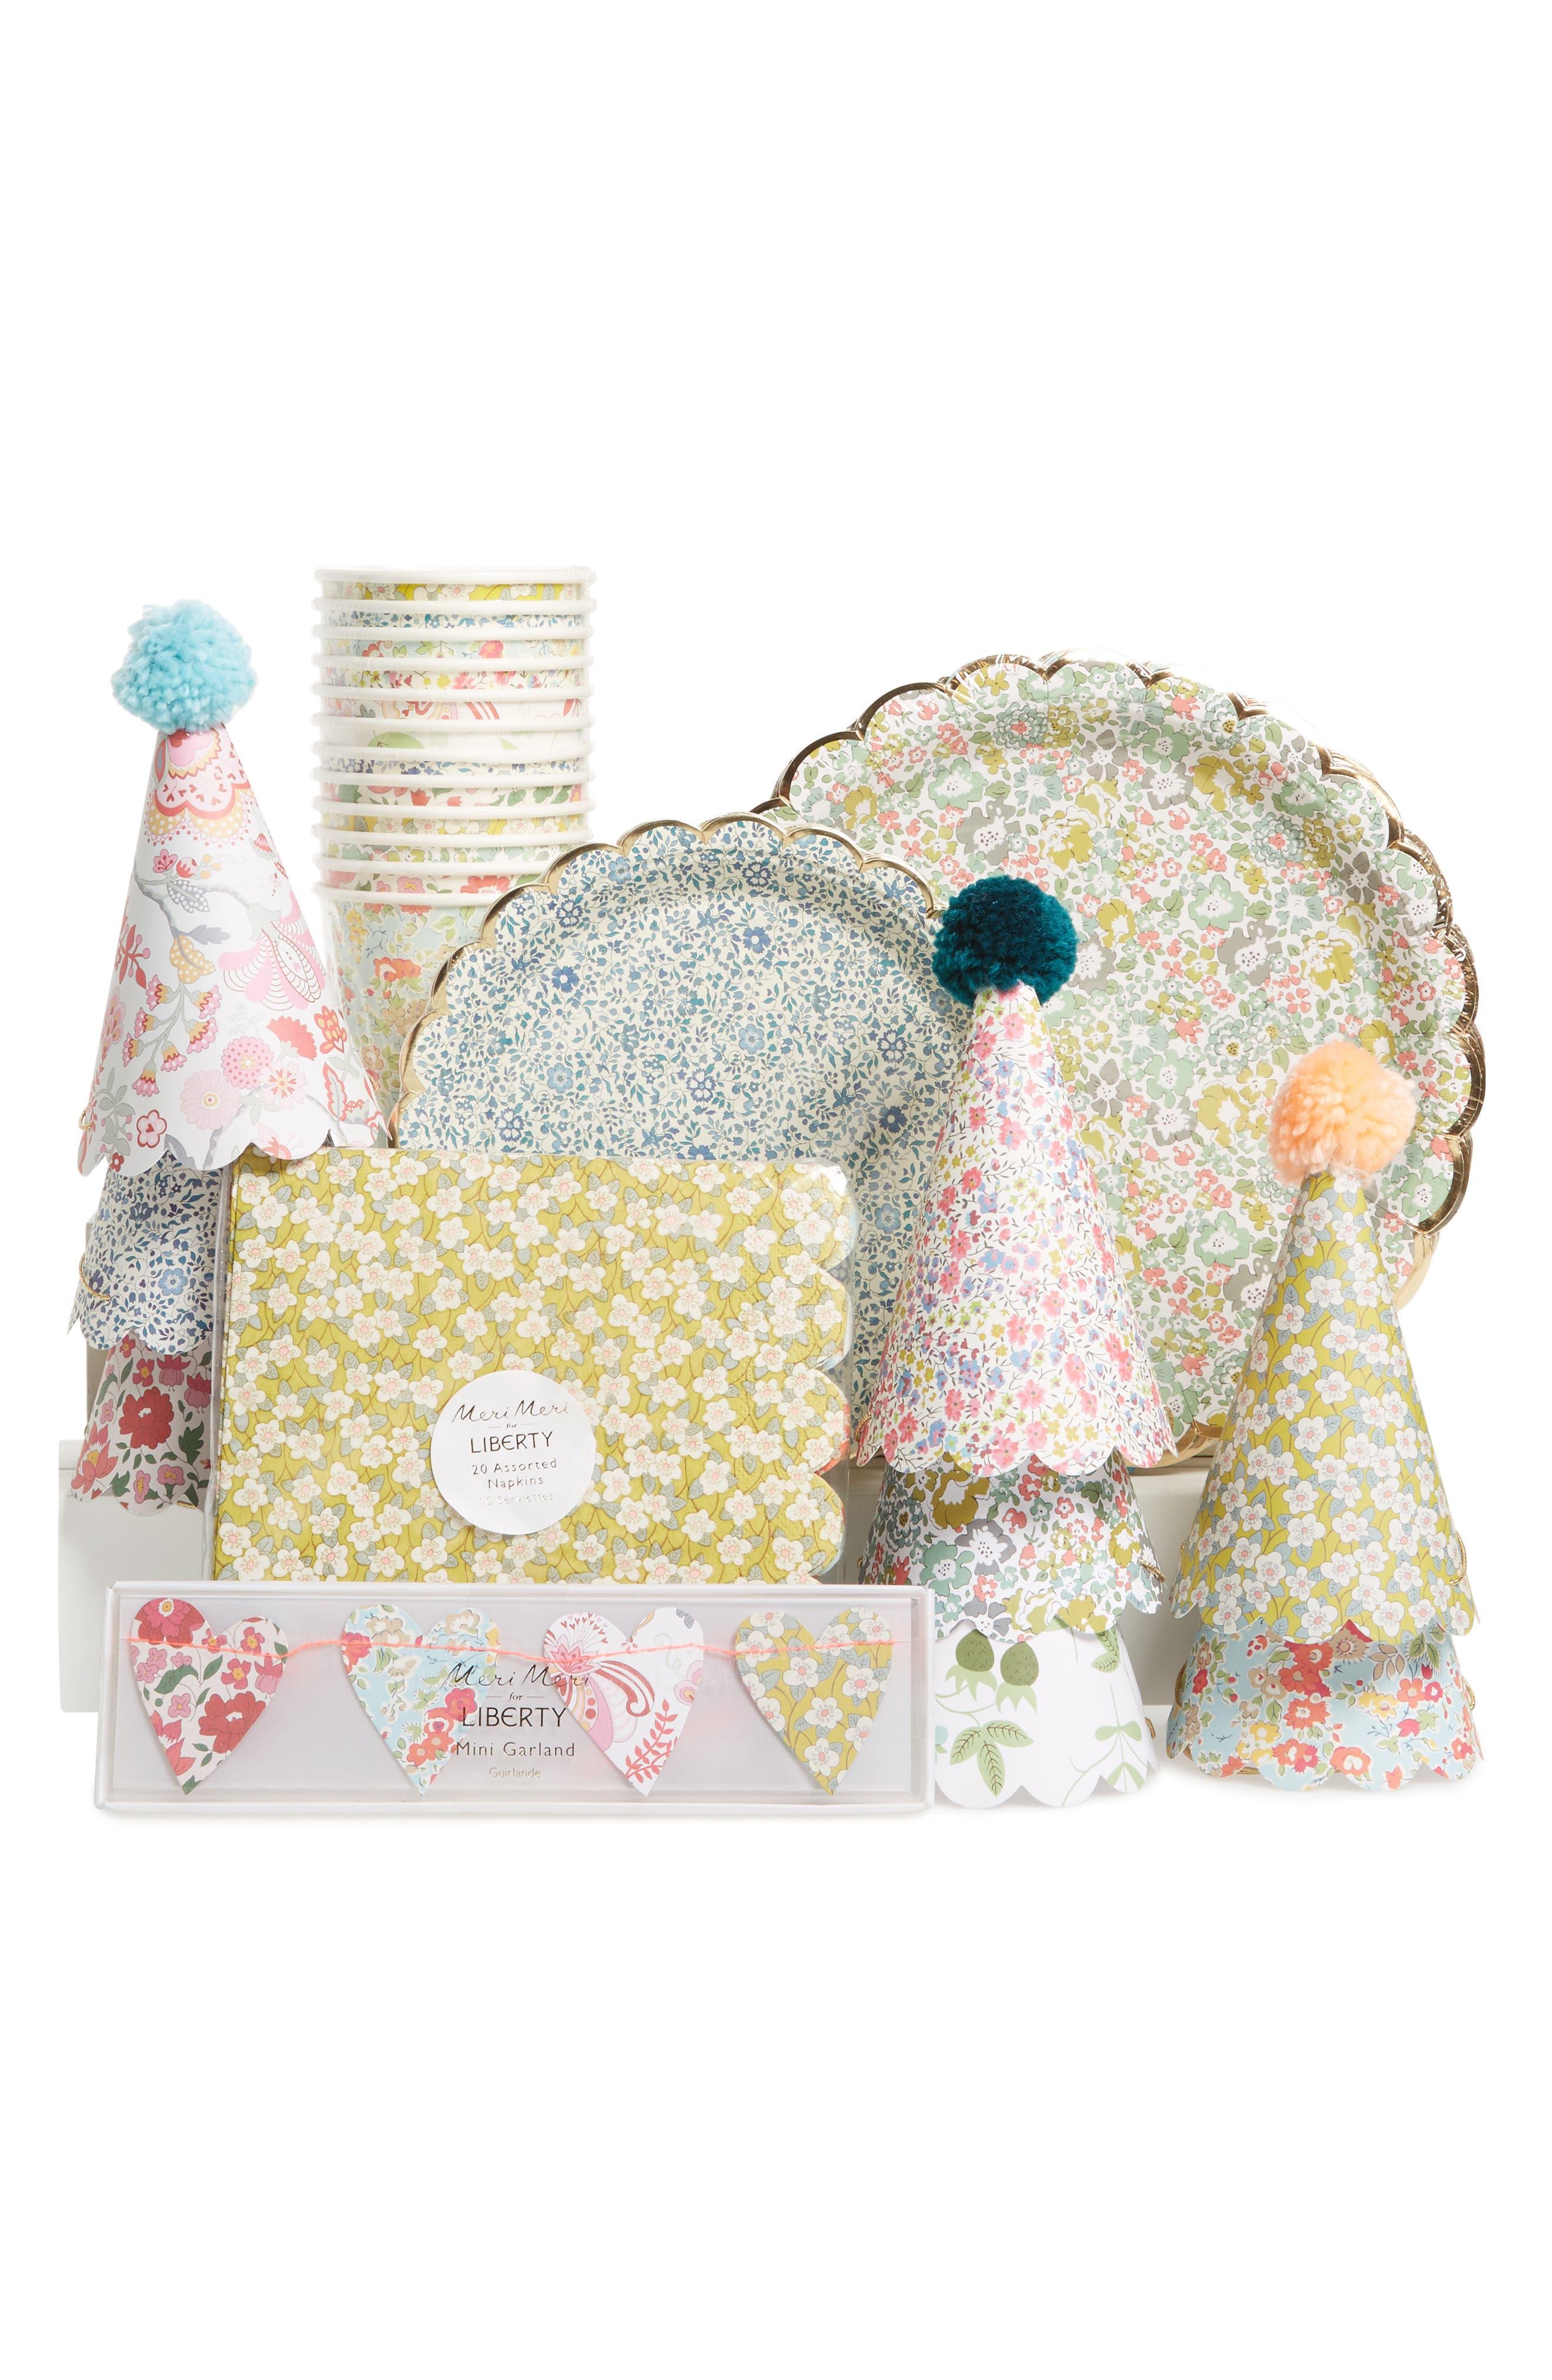 Main Image - Meri Meri x Liberty Decoration Party Bundle